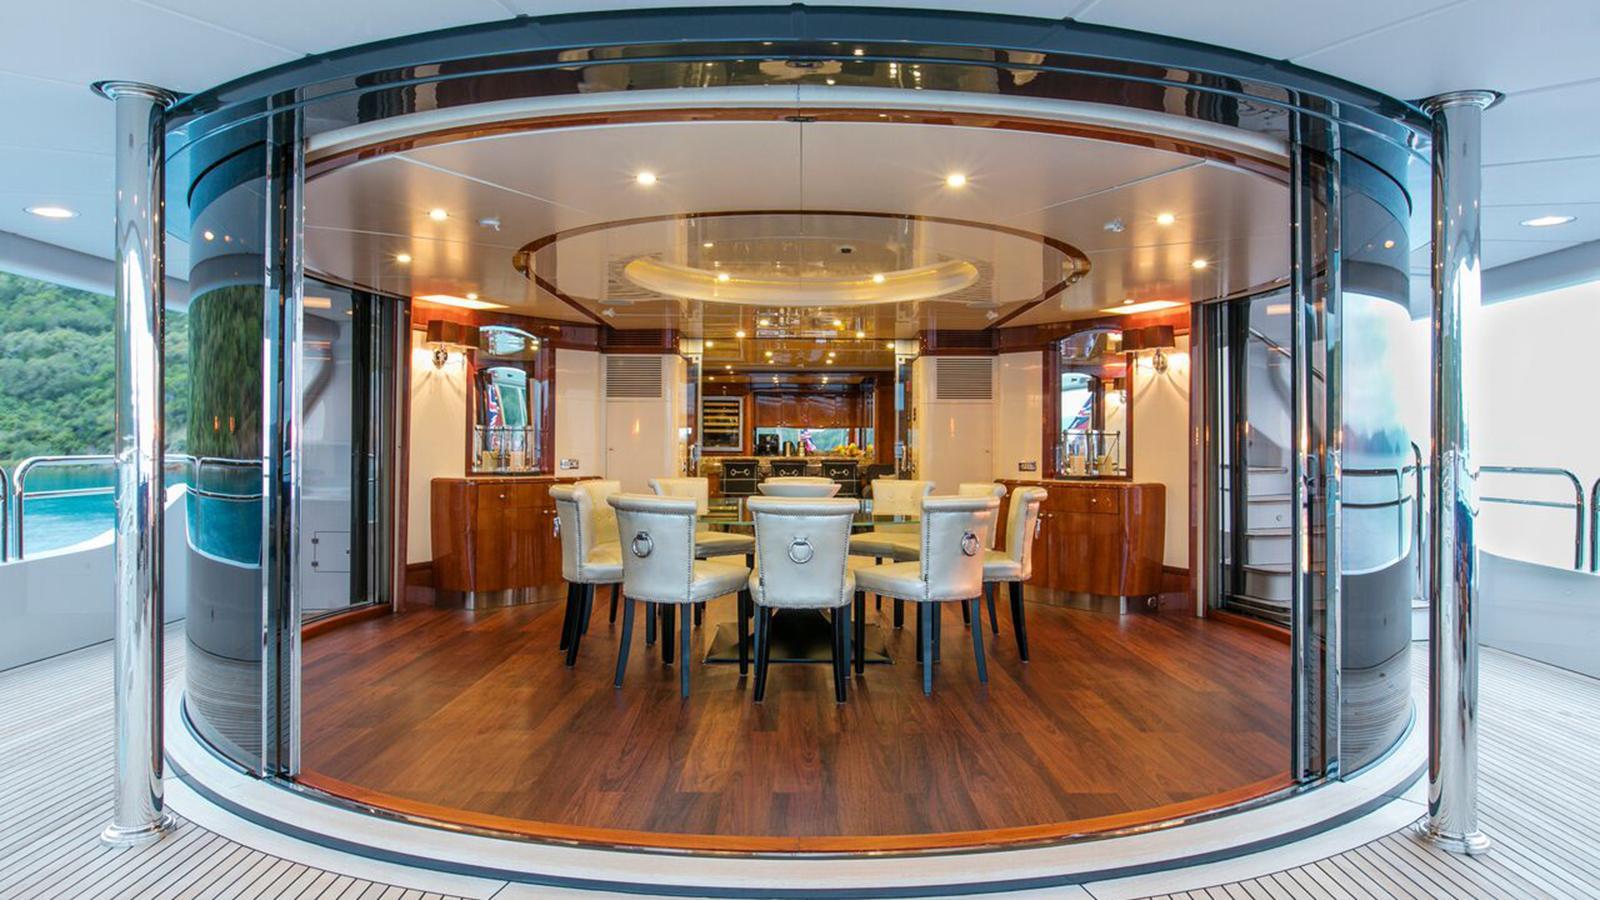 sovereign-motor-yacht-benetti-2002-44m-circular-dining-room